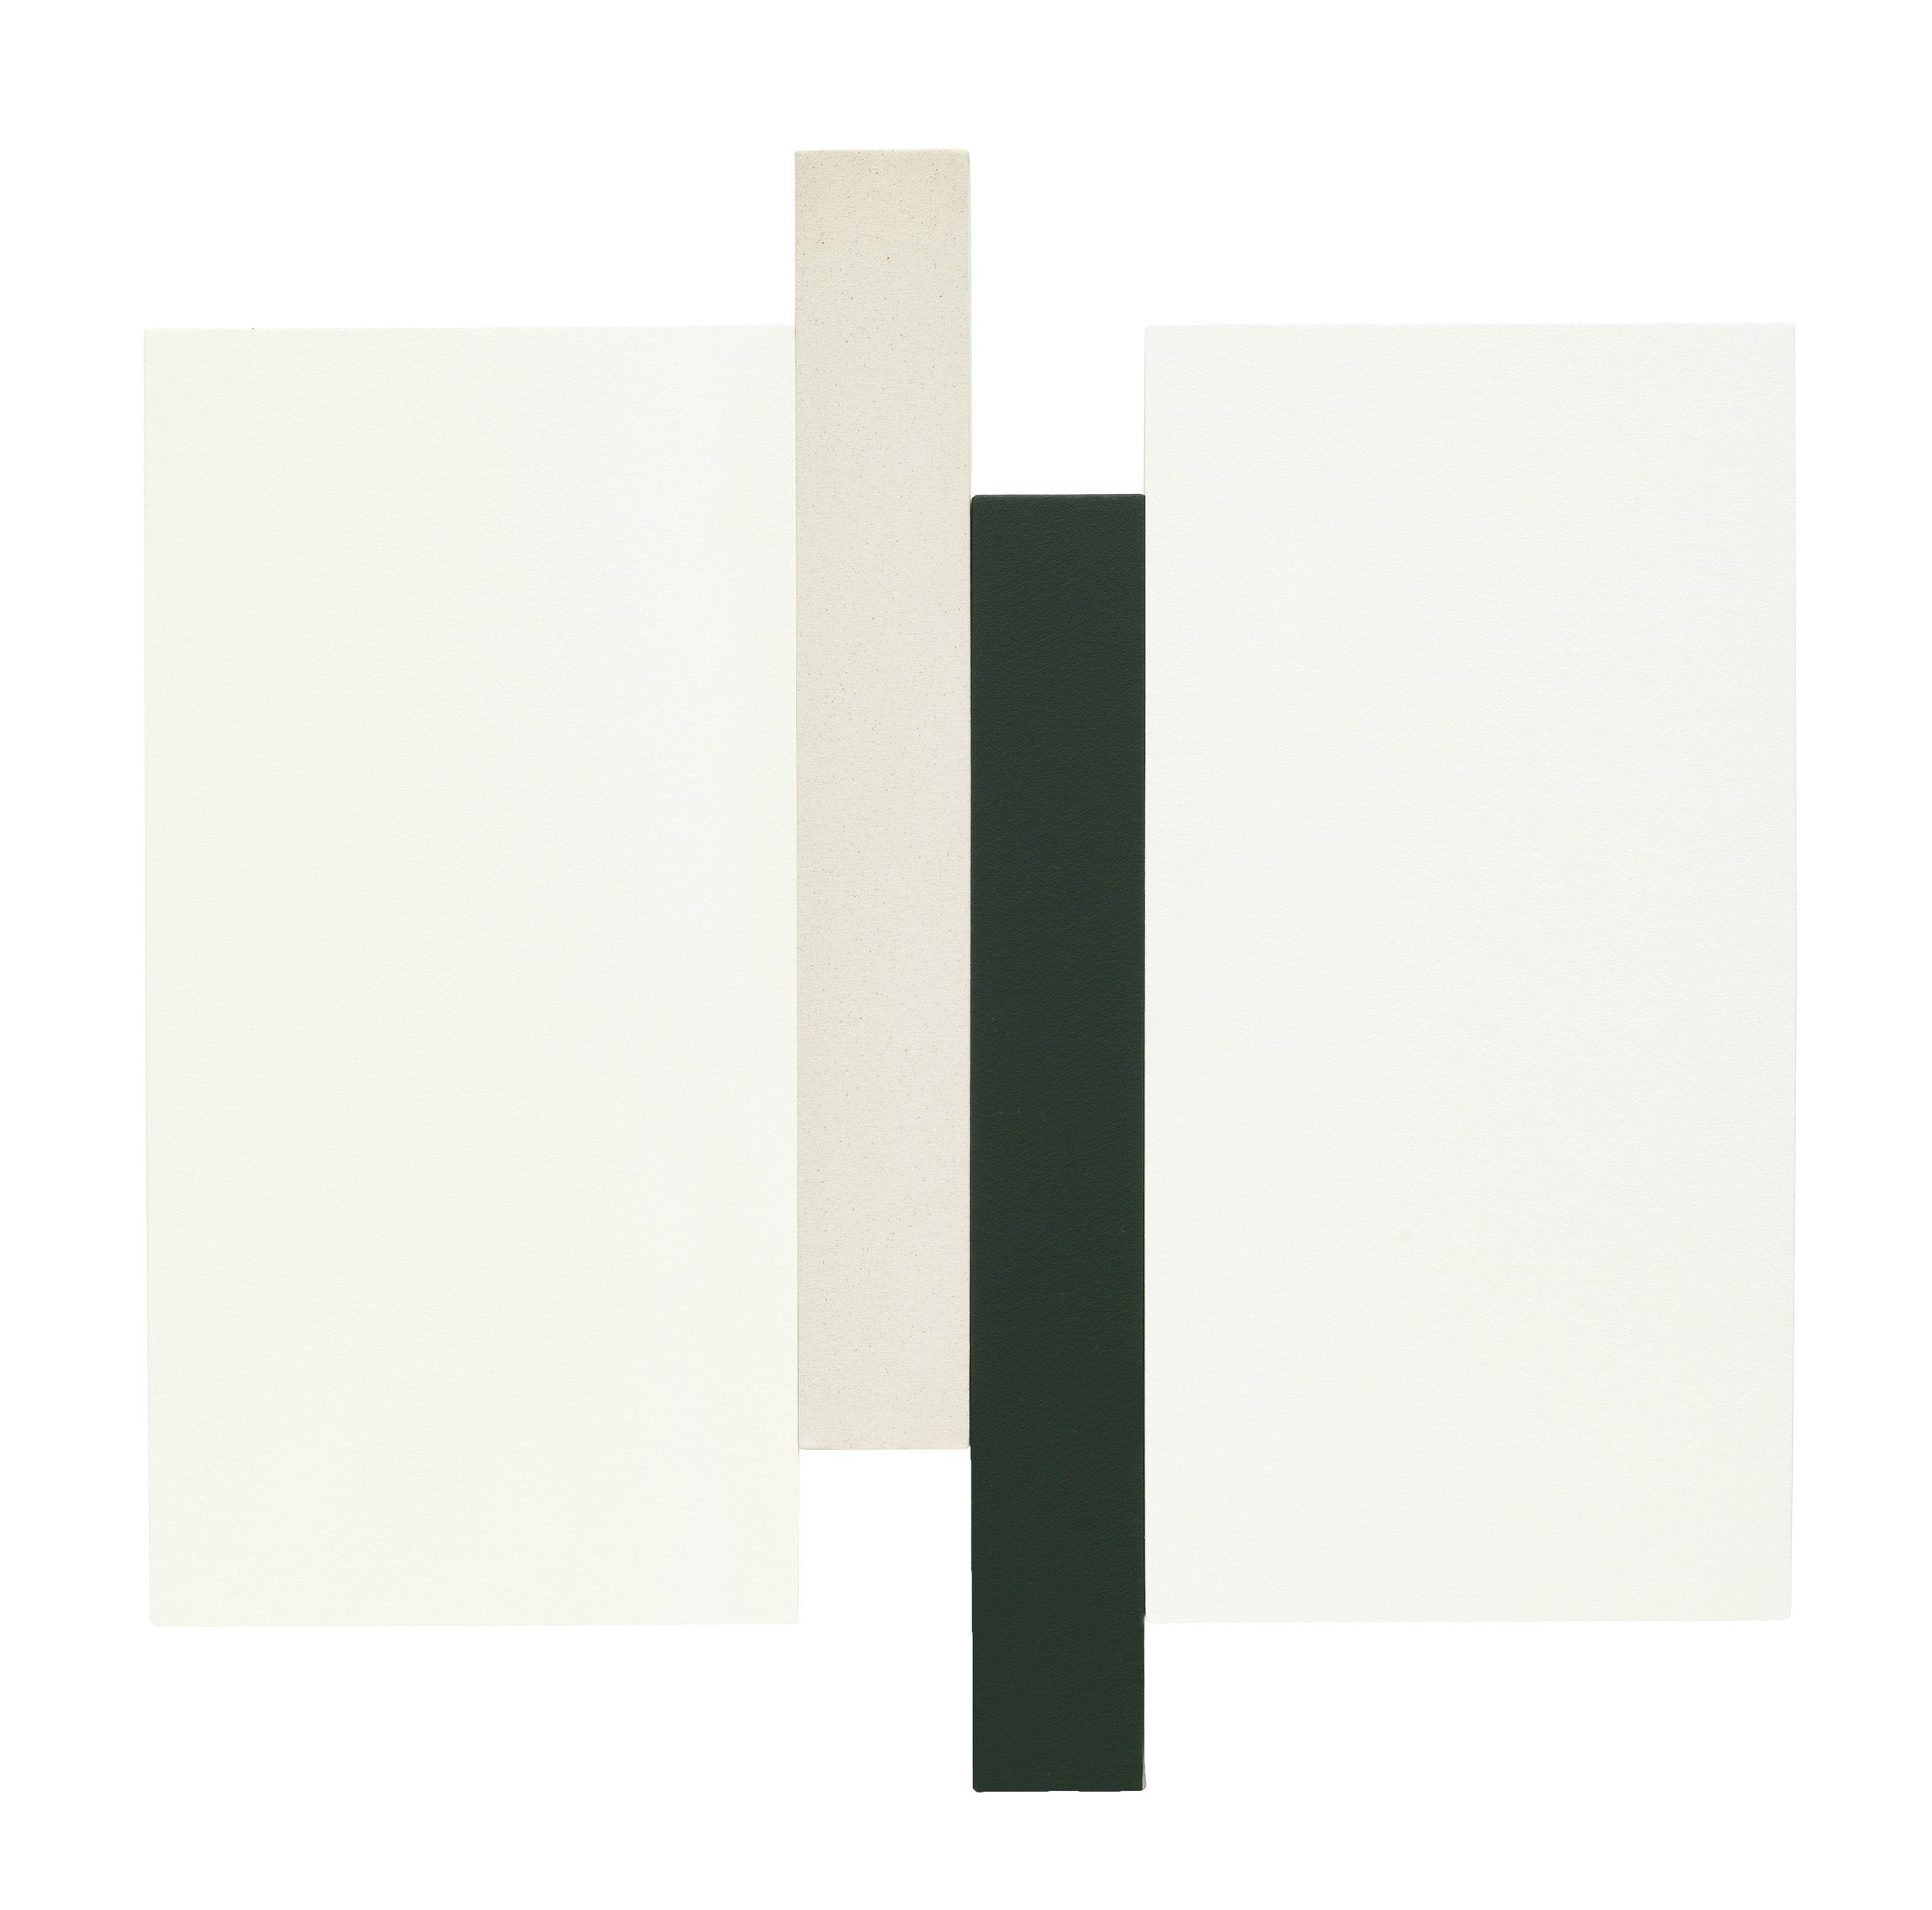 ARUPA - WHITE, GREEN, CANVAS